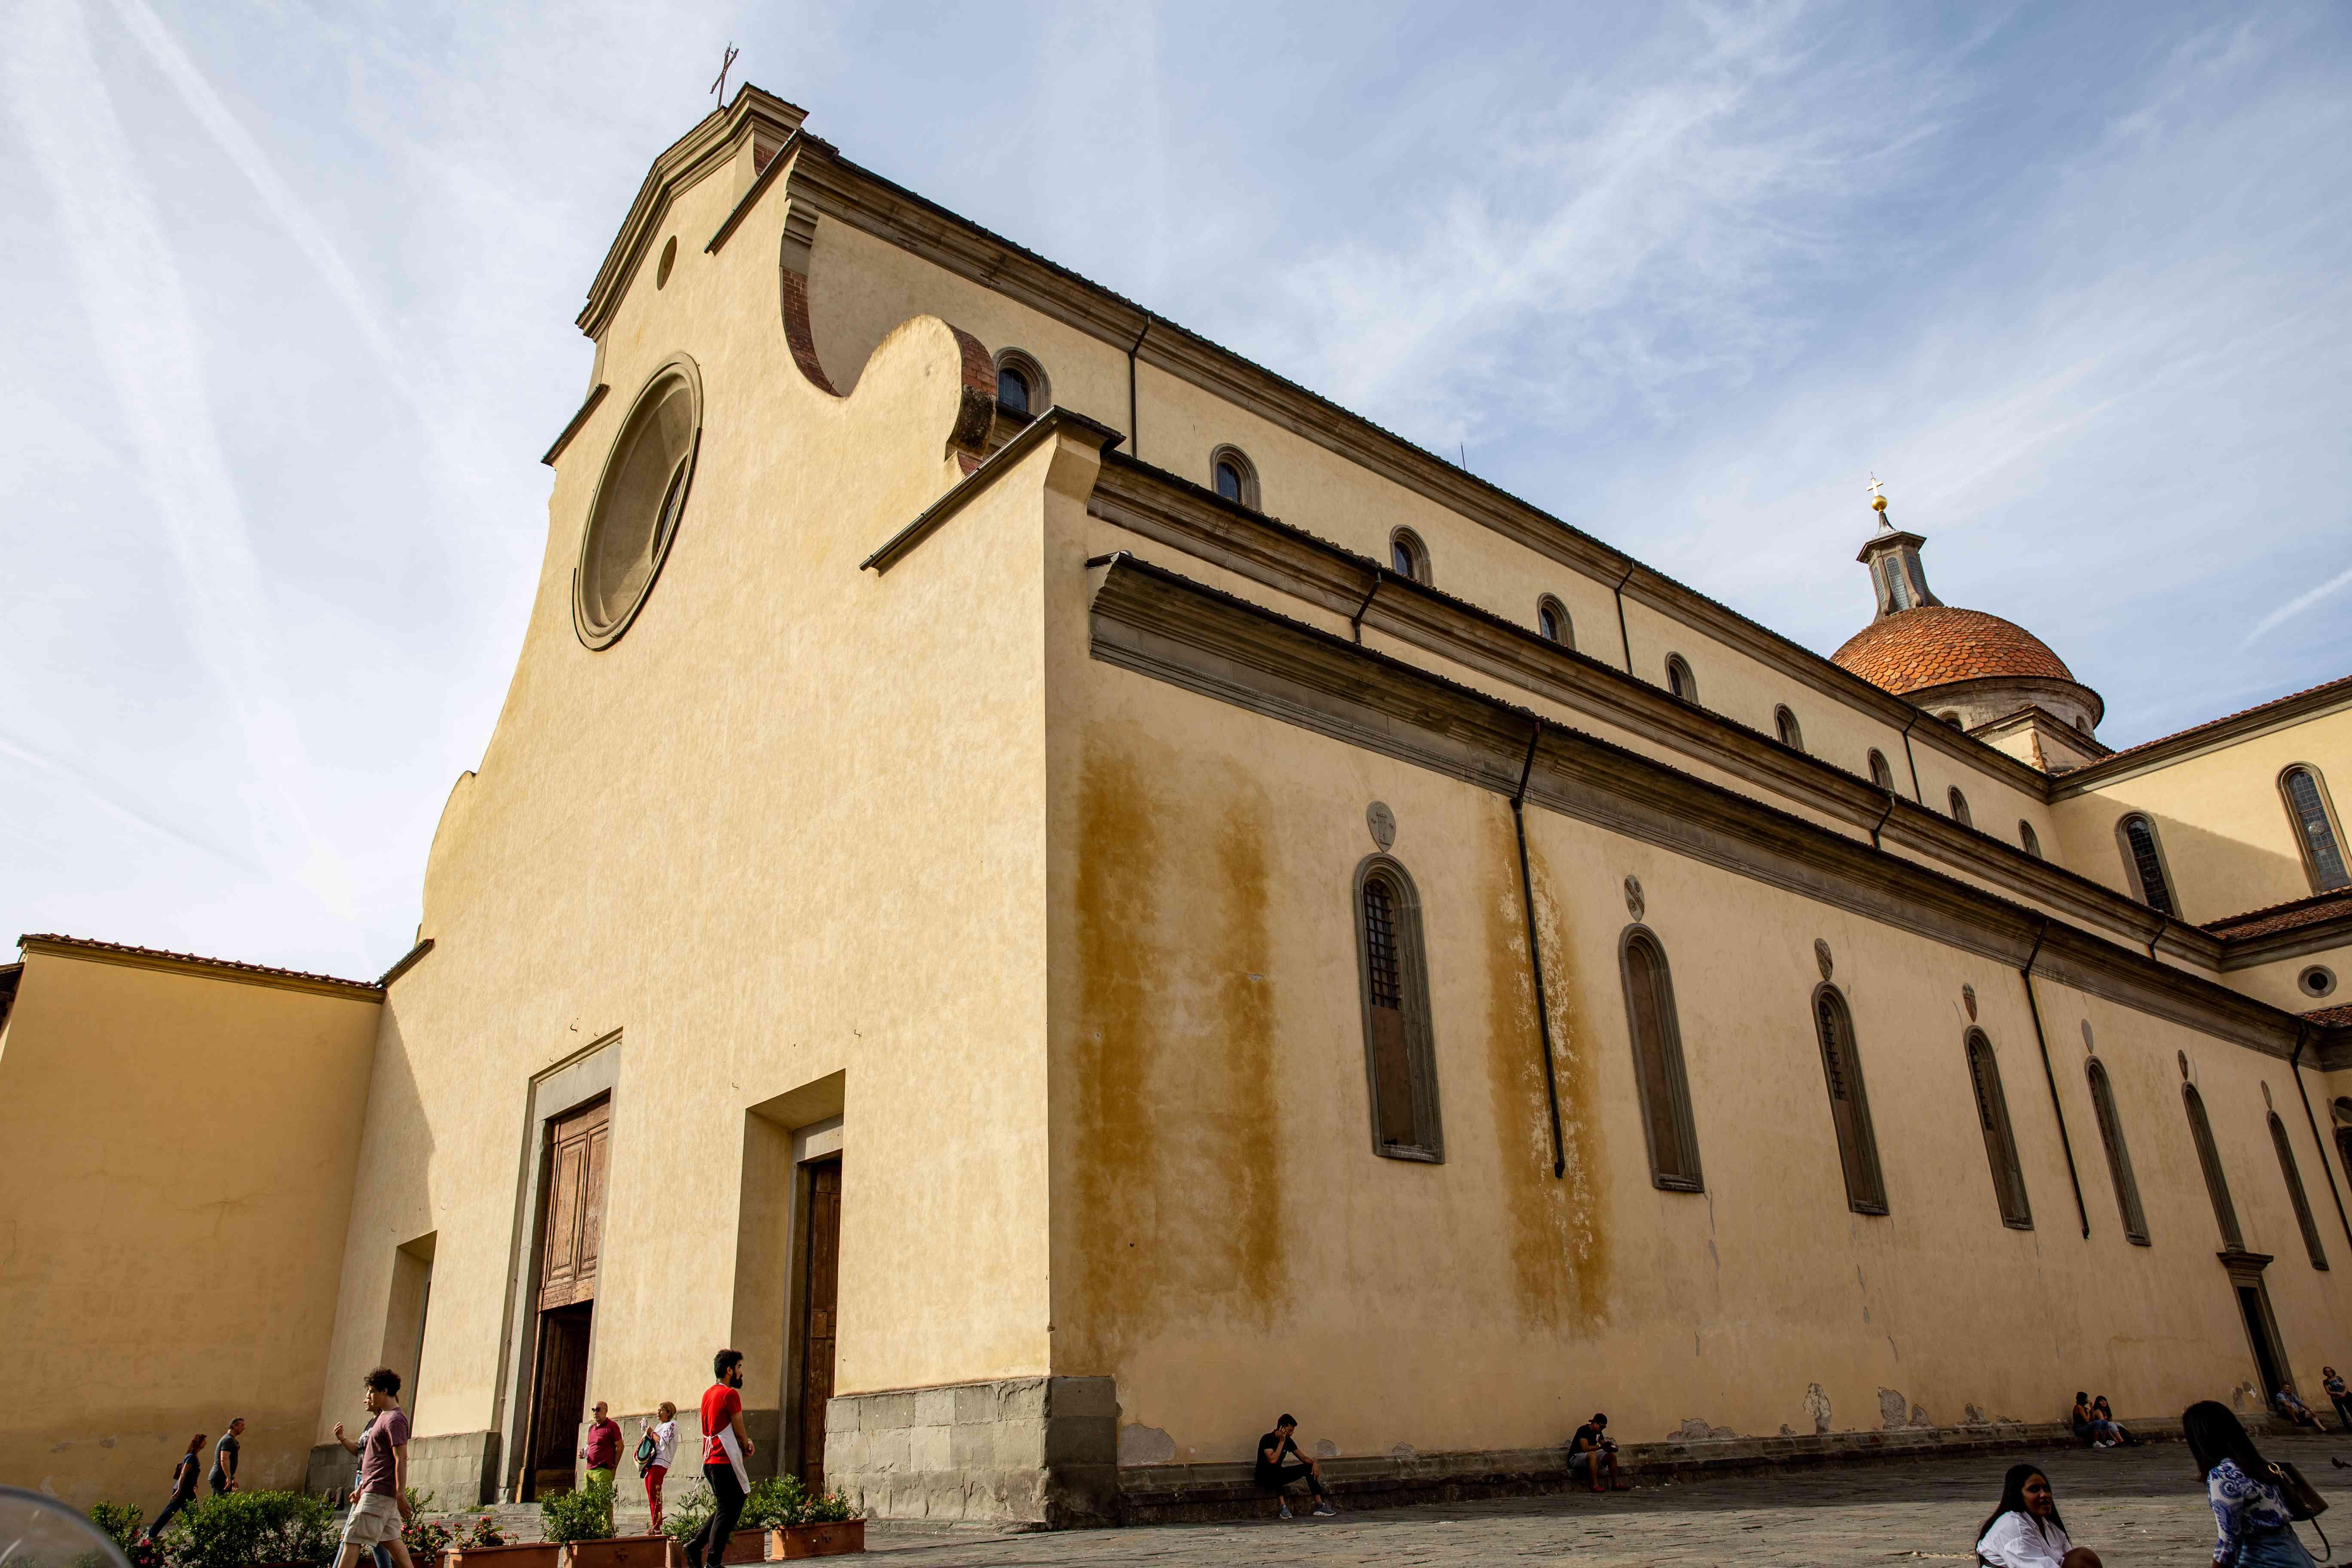 Basilica di Santo Spirito in Florence, Italy